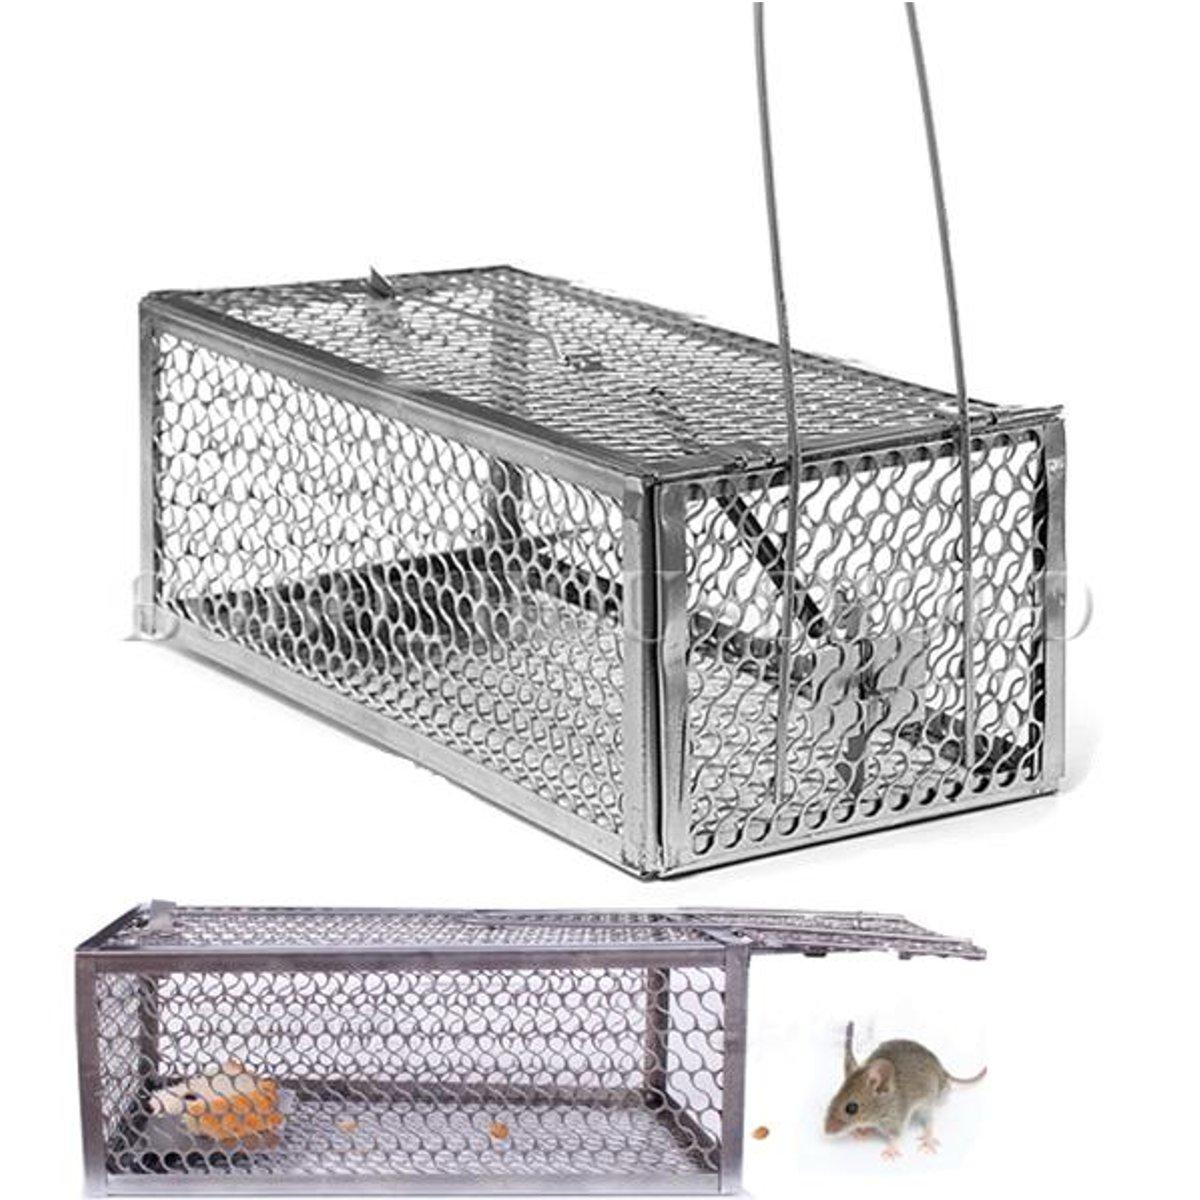 Huane Mouse Cage Mouse Trap High Sensitivity Rat Control Catcher Trap Pest Live Animal Catch Capture Hamster Gardening Supplies